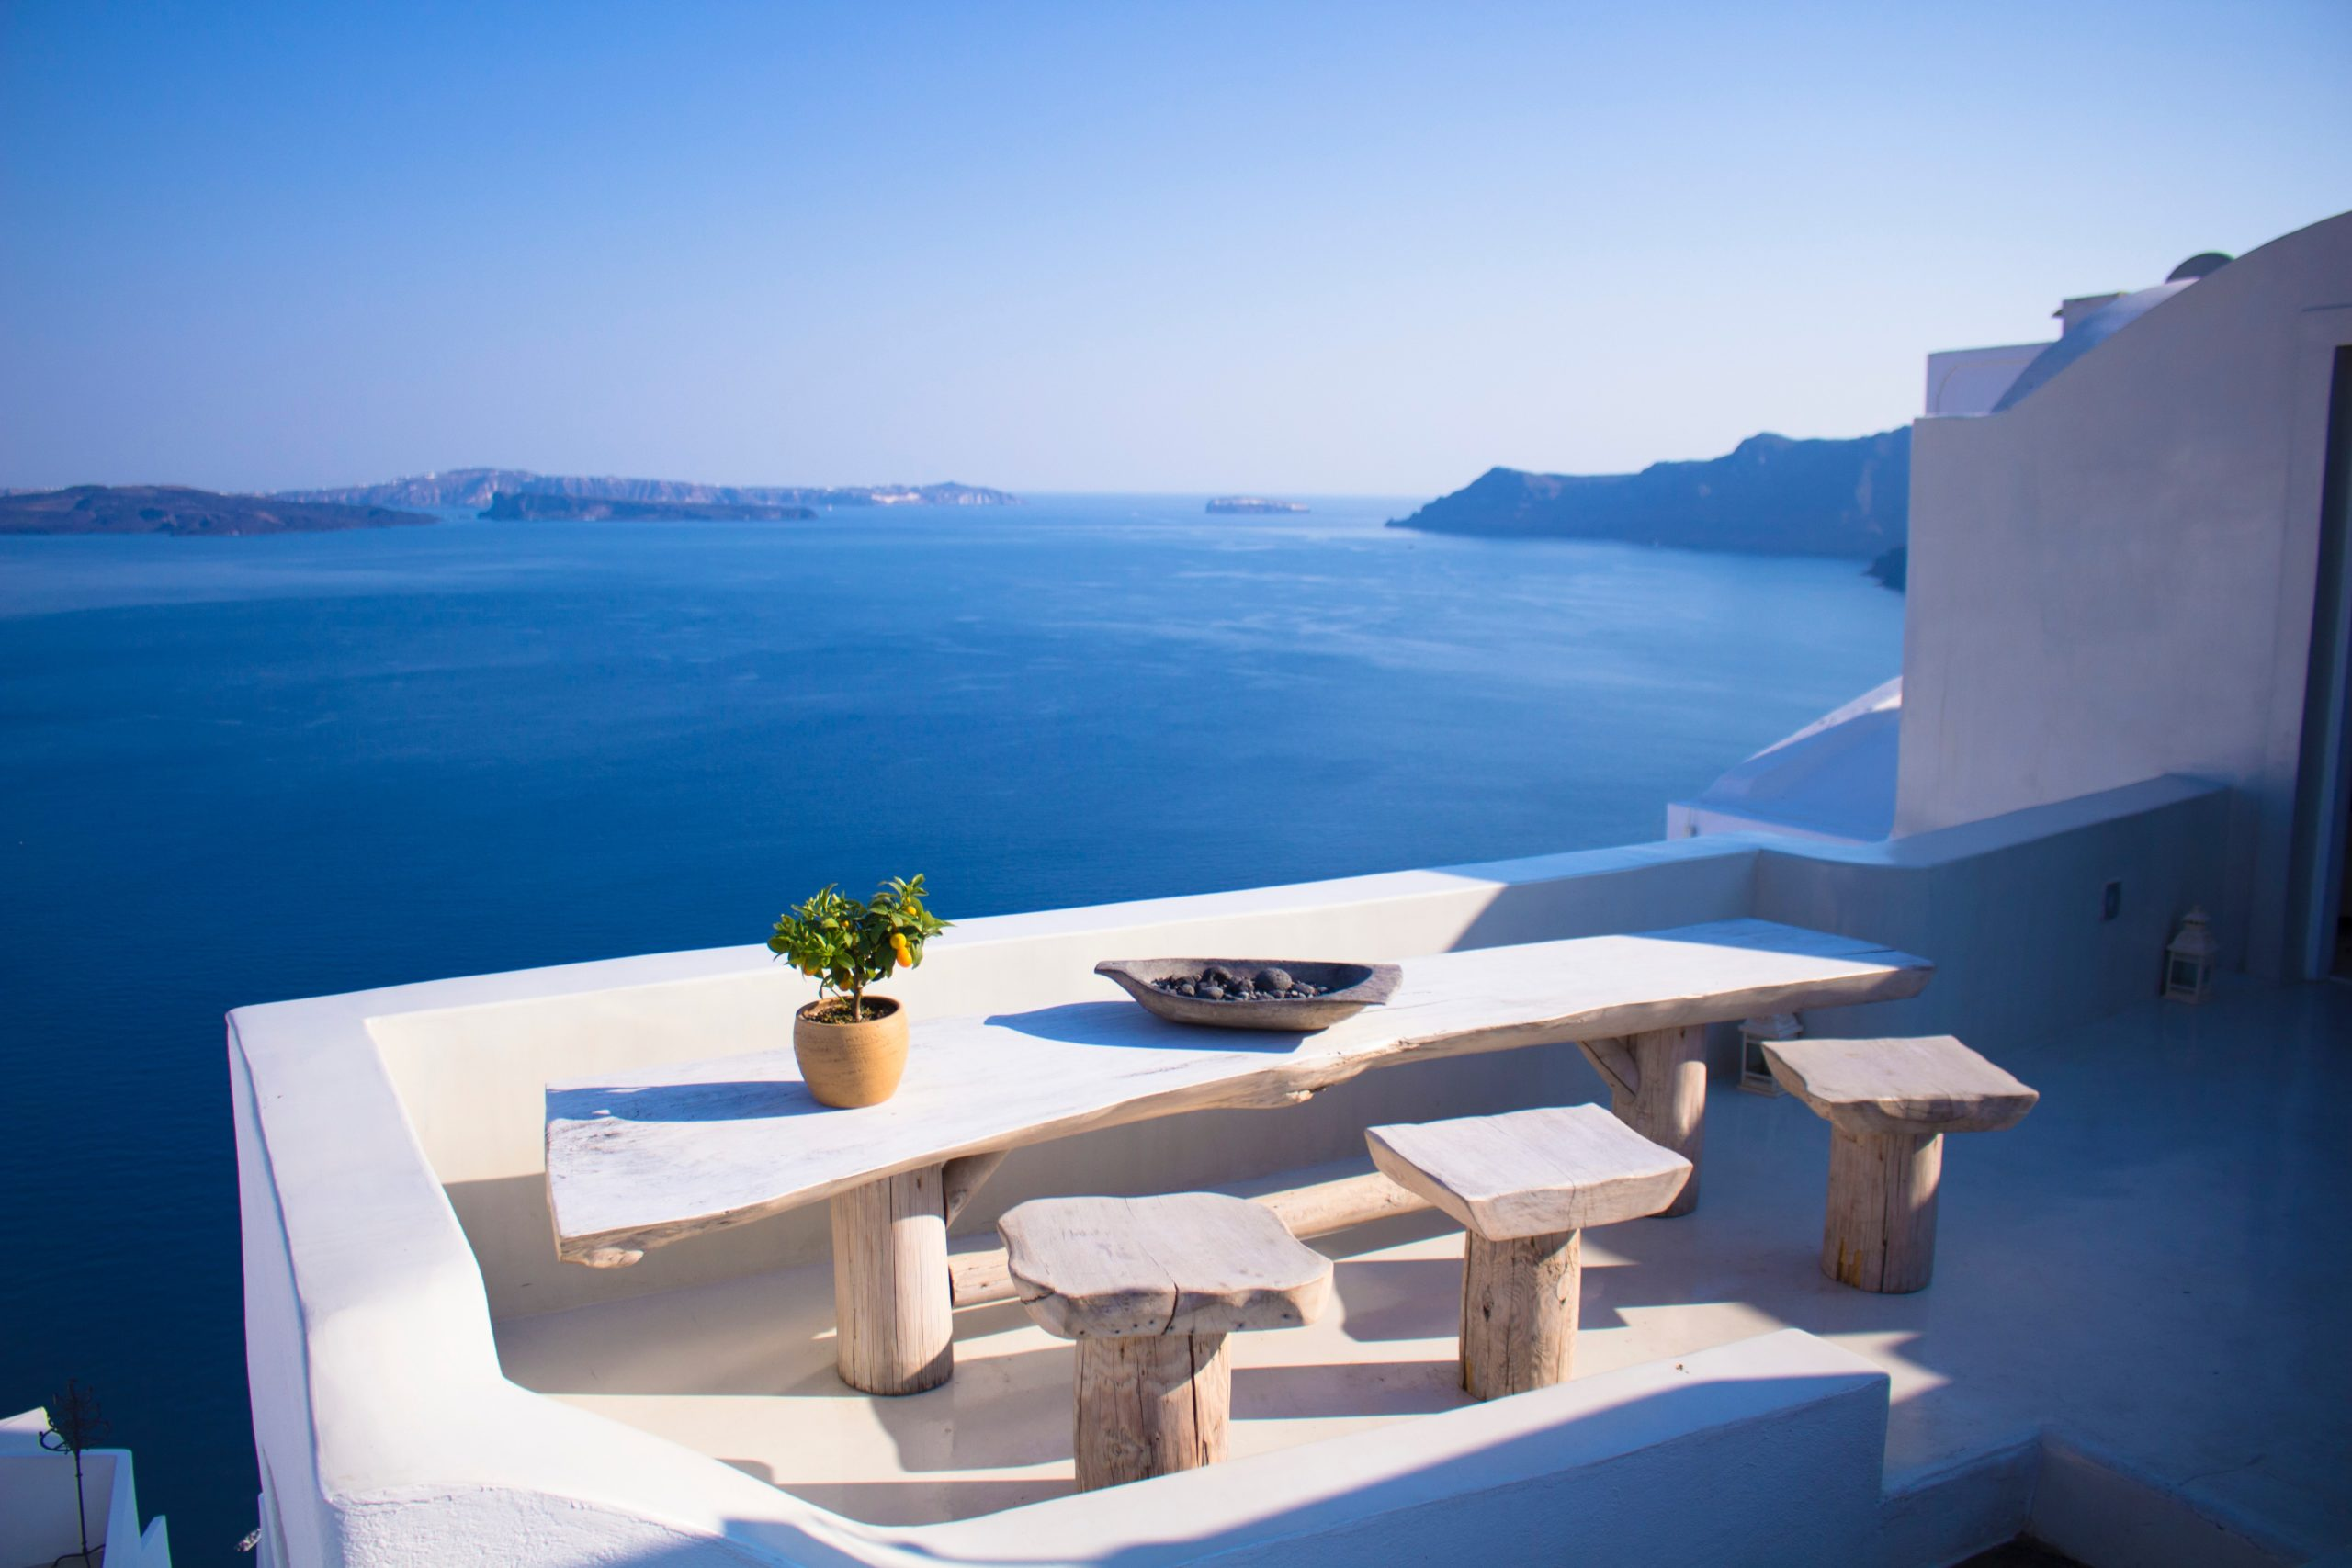 greece scenery of water